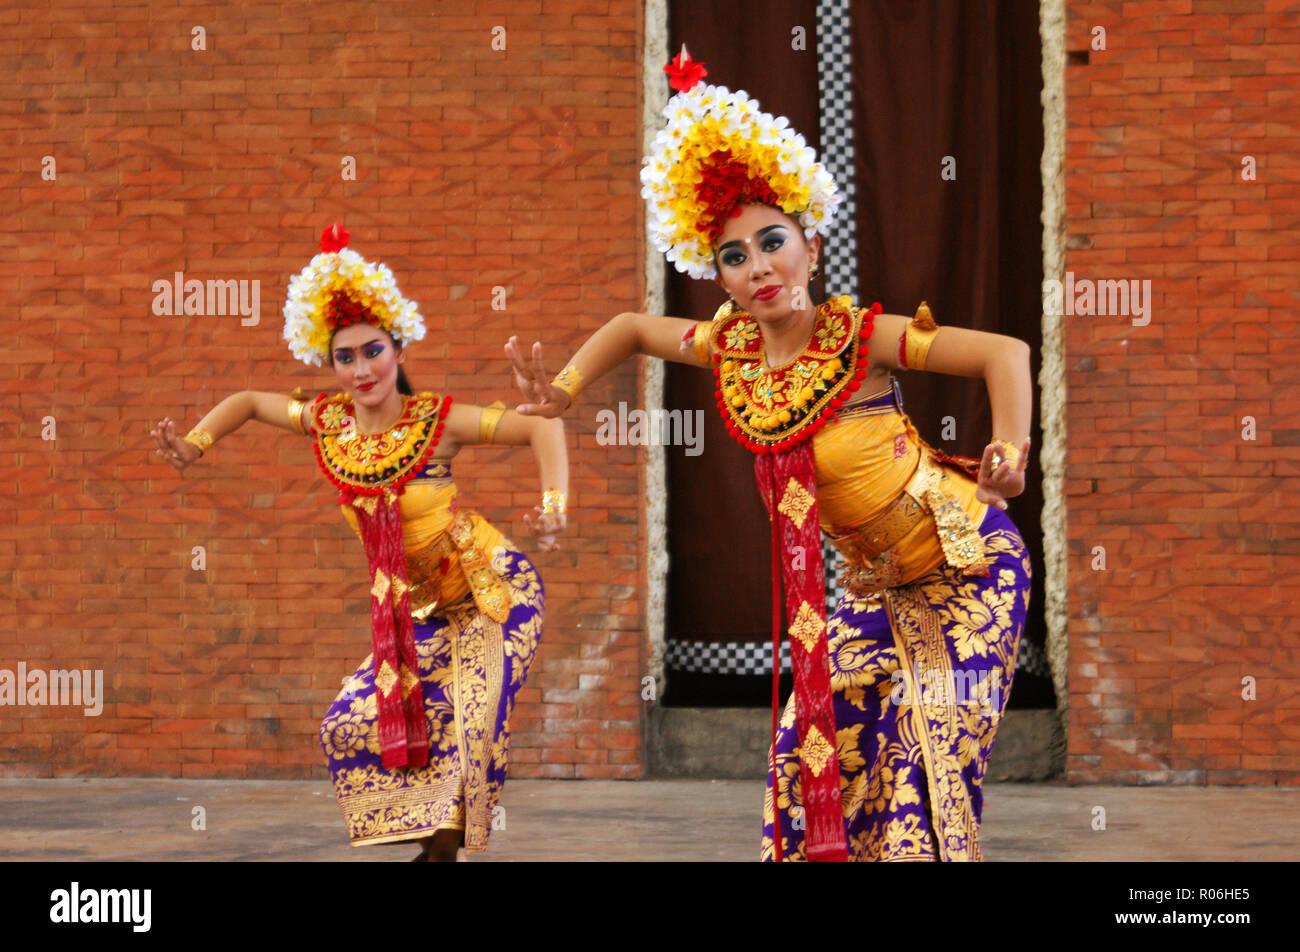 bali dancer bali indonesia